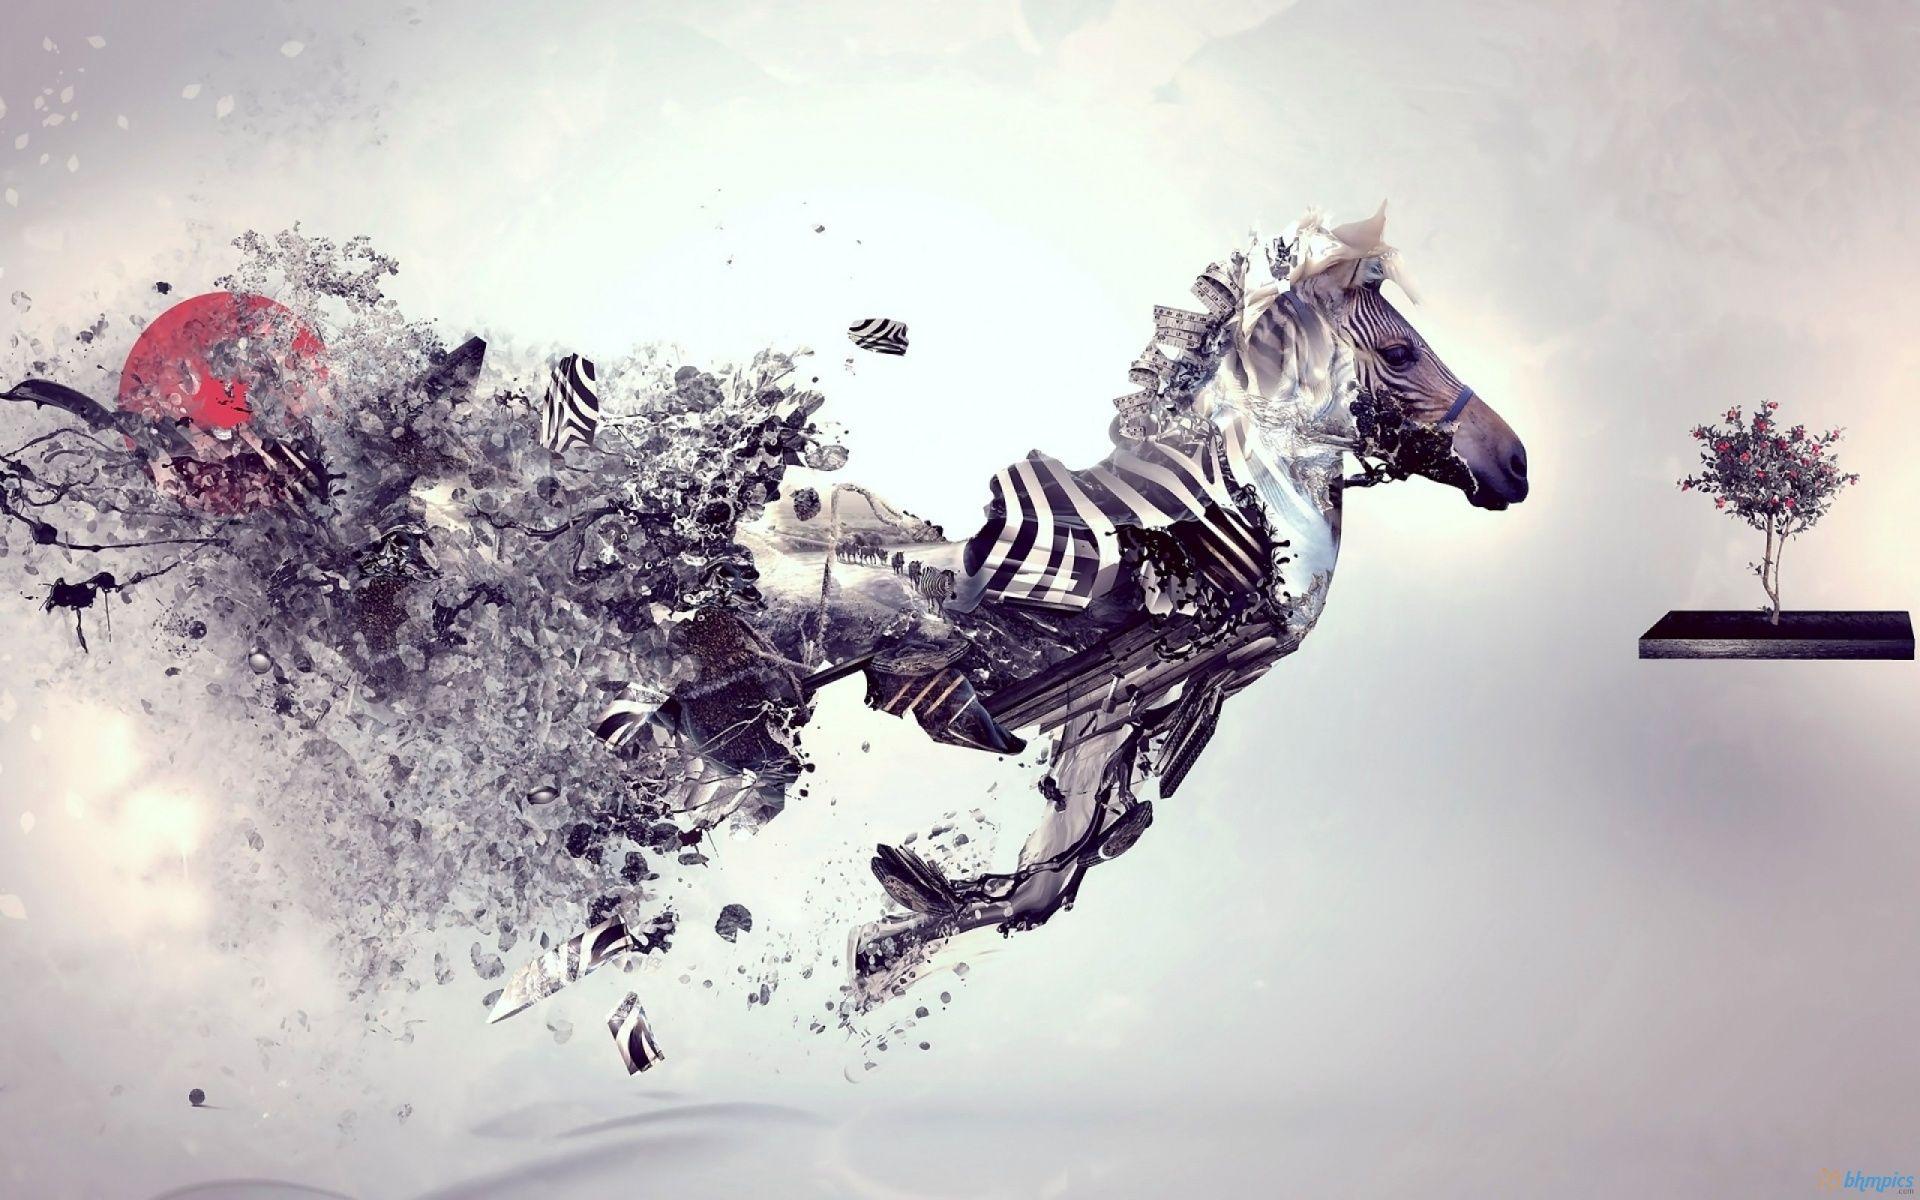 surreal zebra hd desktop wallpaper, images and photos | wowza